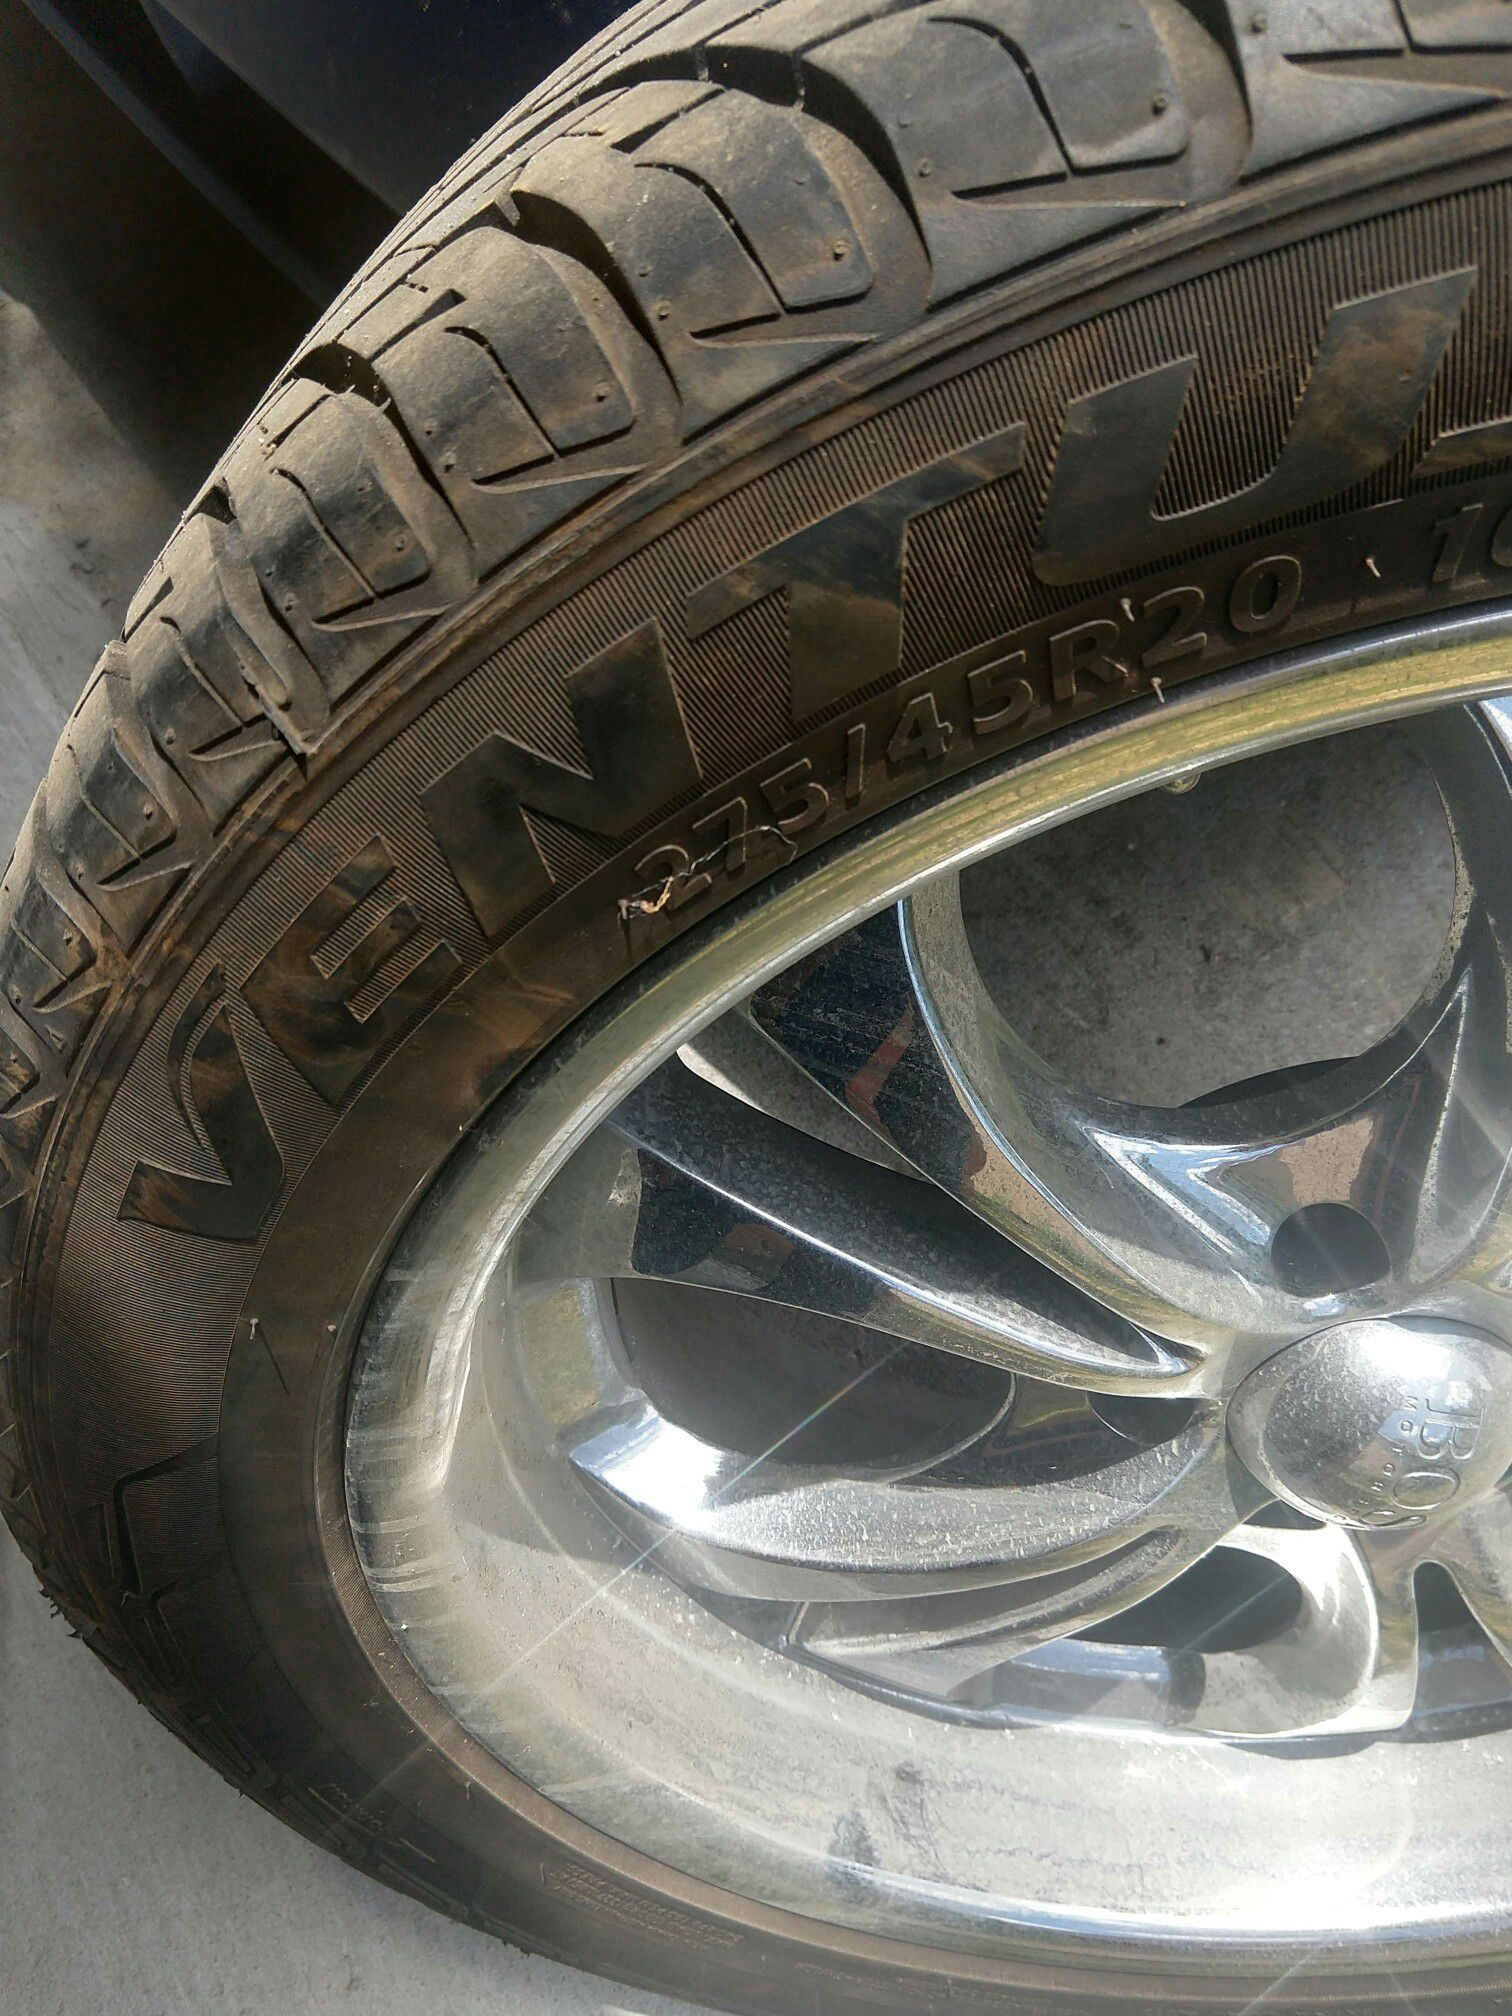 Boss 304 20 inch rims w/tires